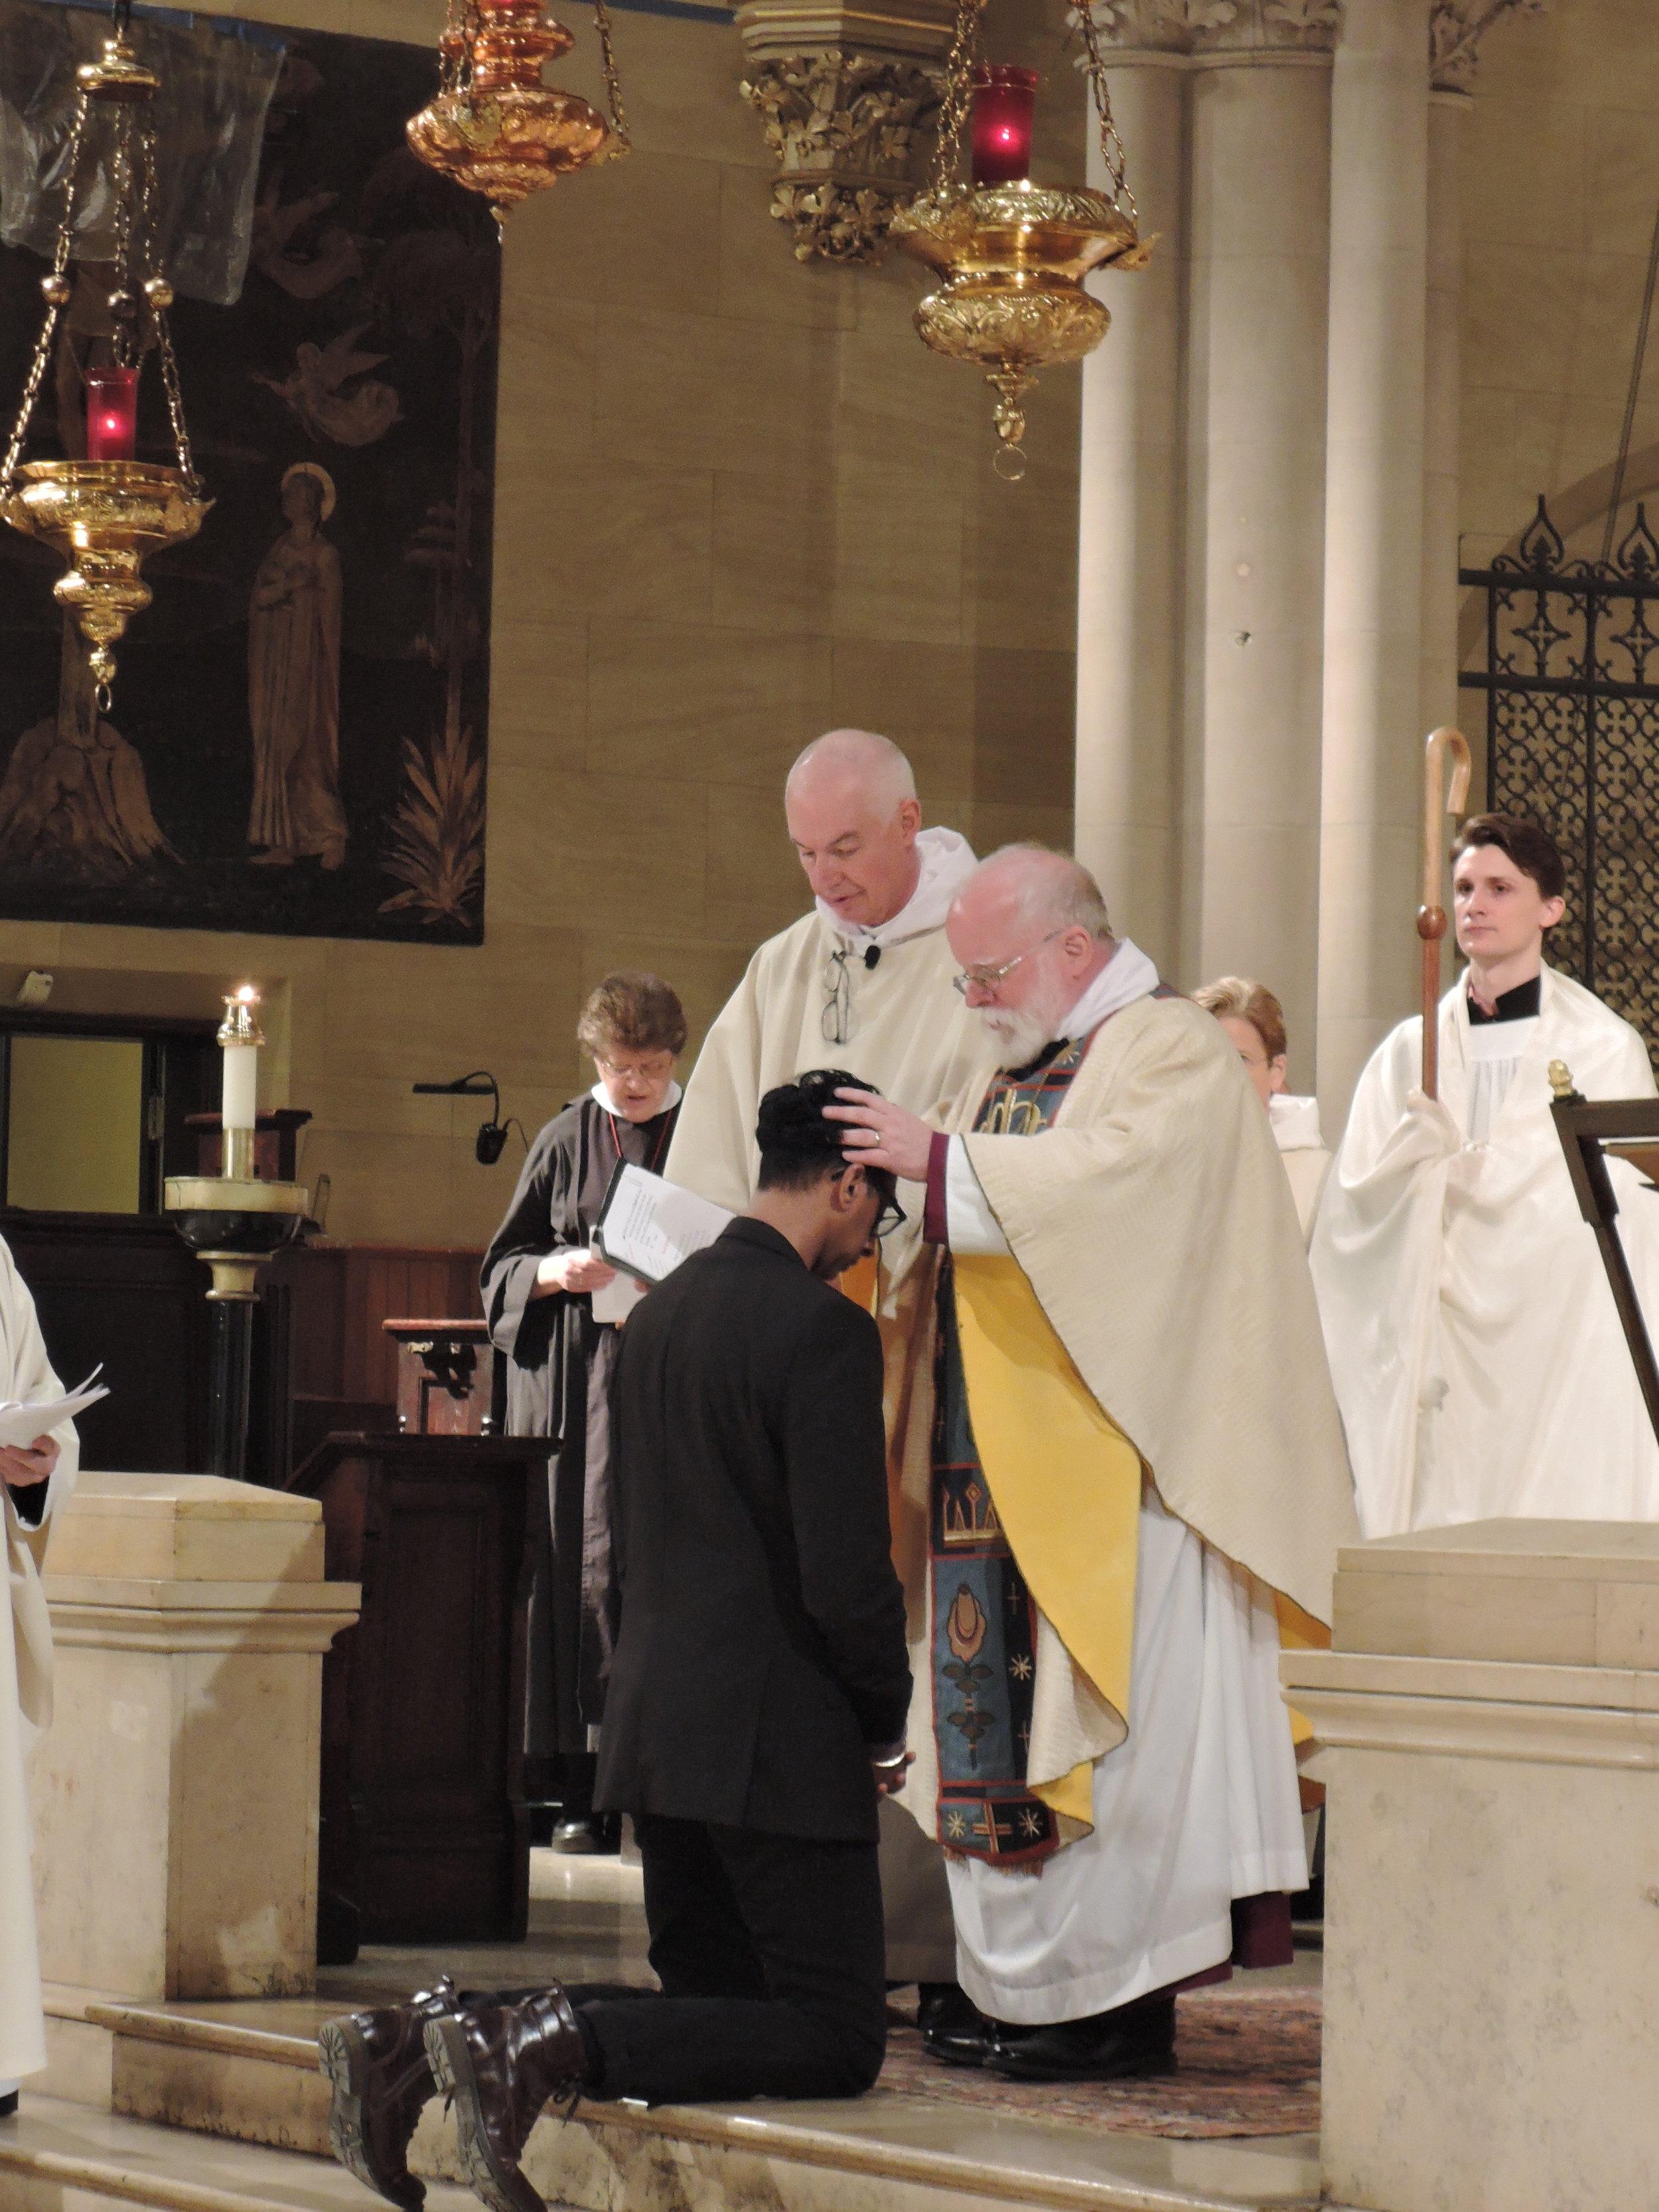 The Bishop confirms Dexter Baksh